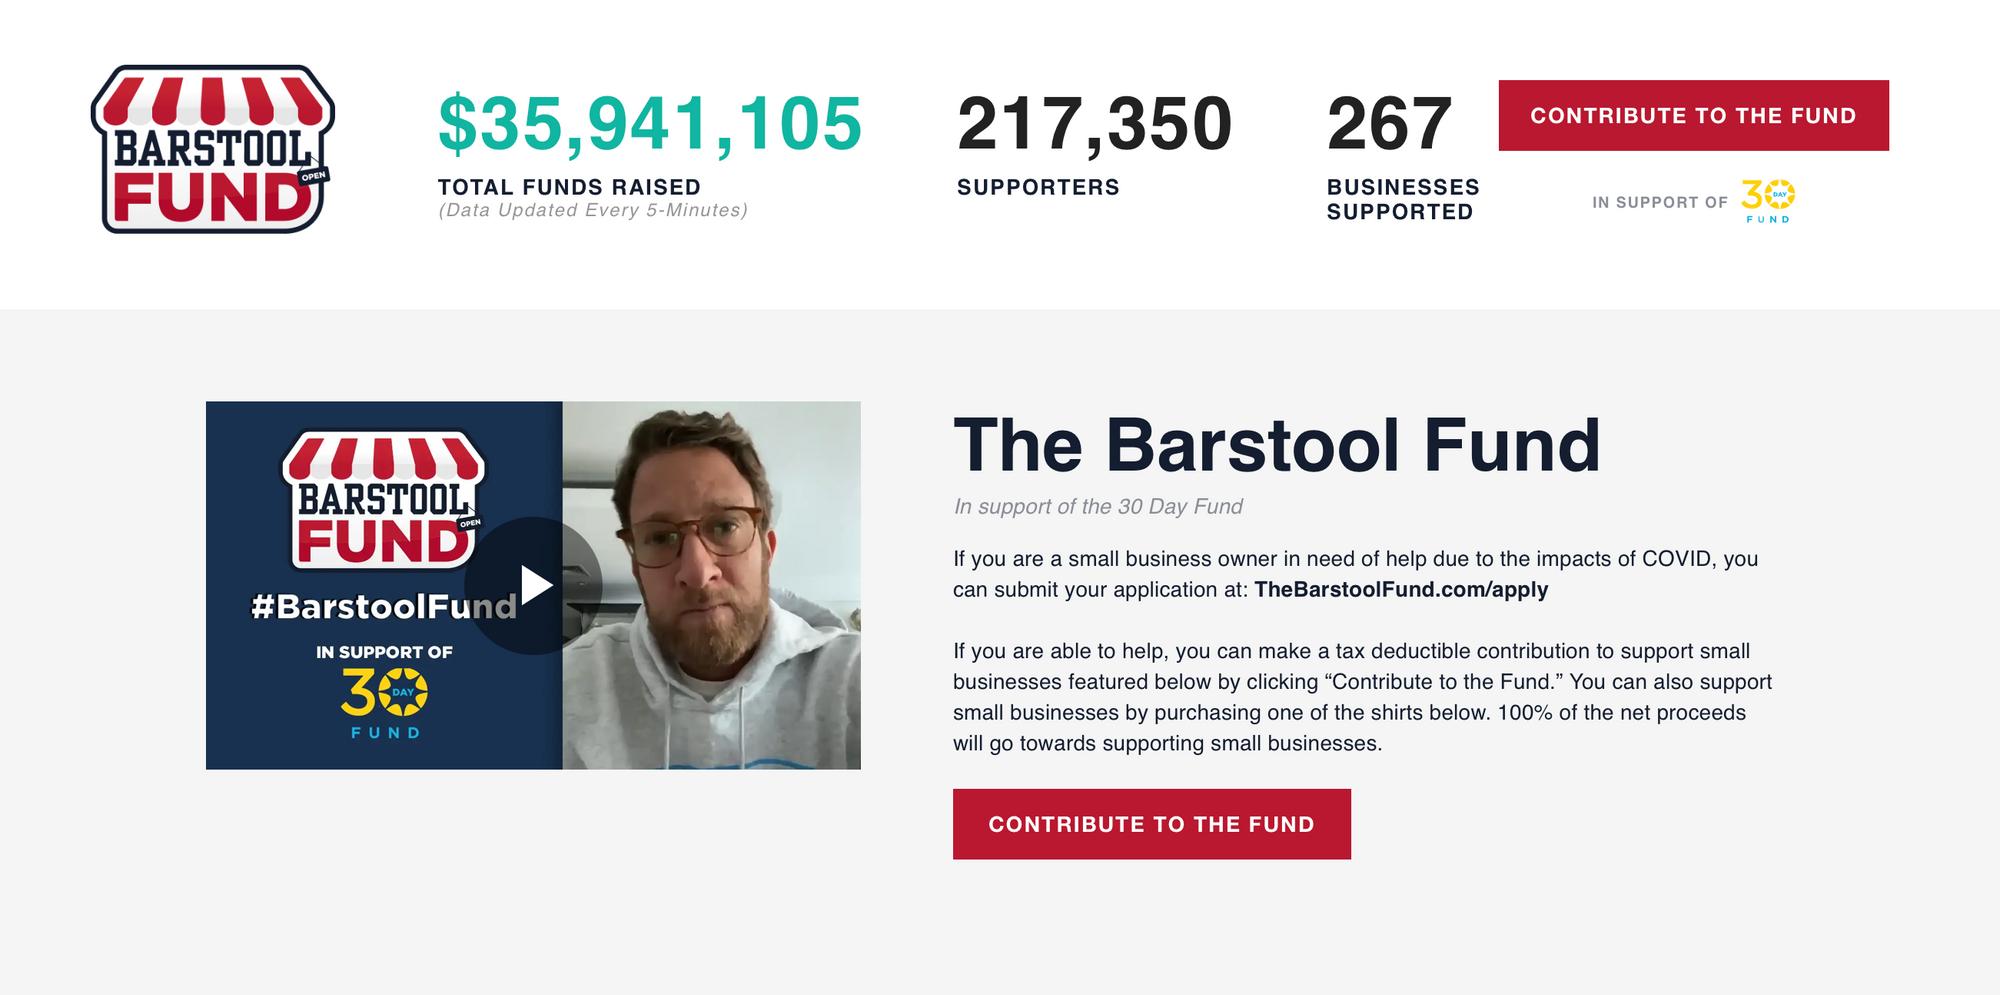 The Barstool Fund